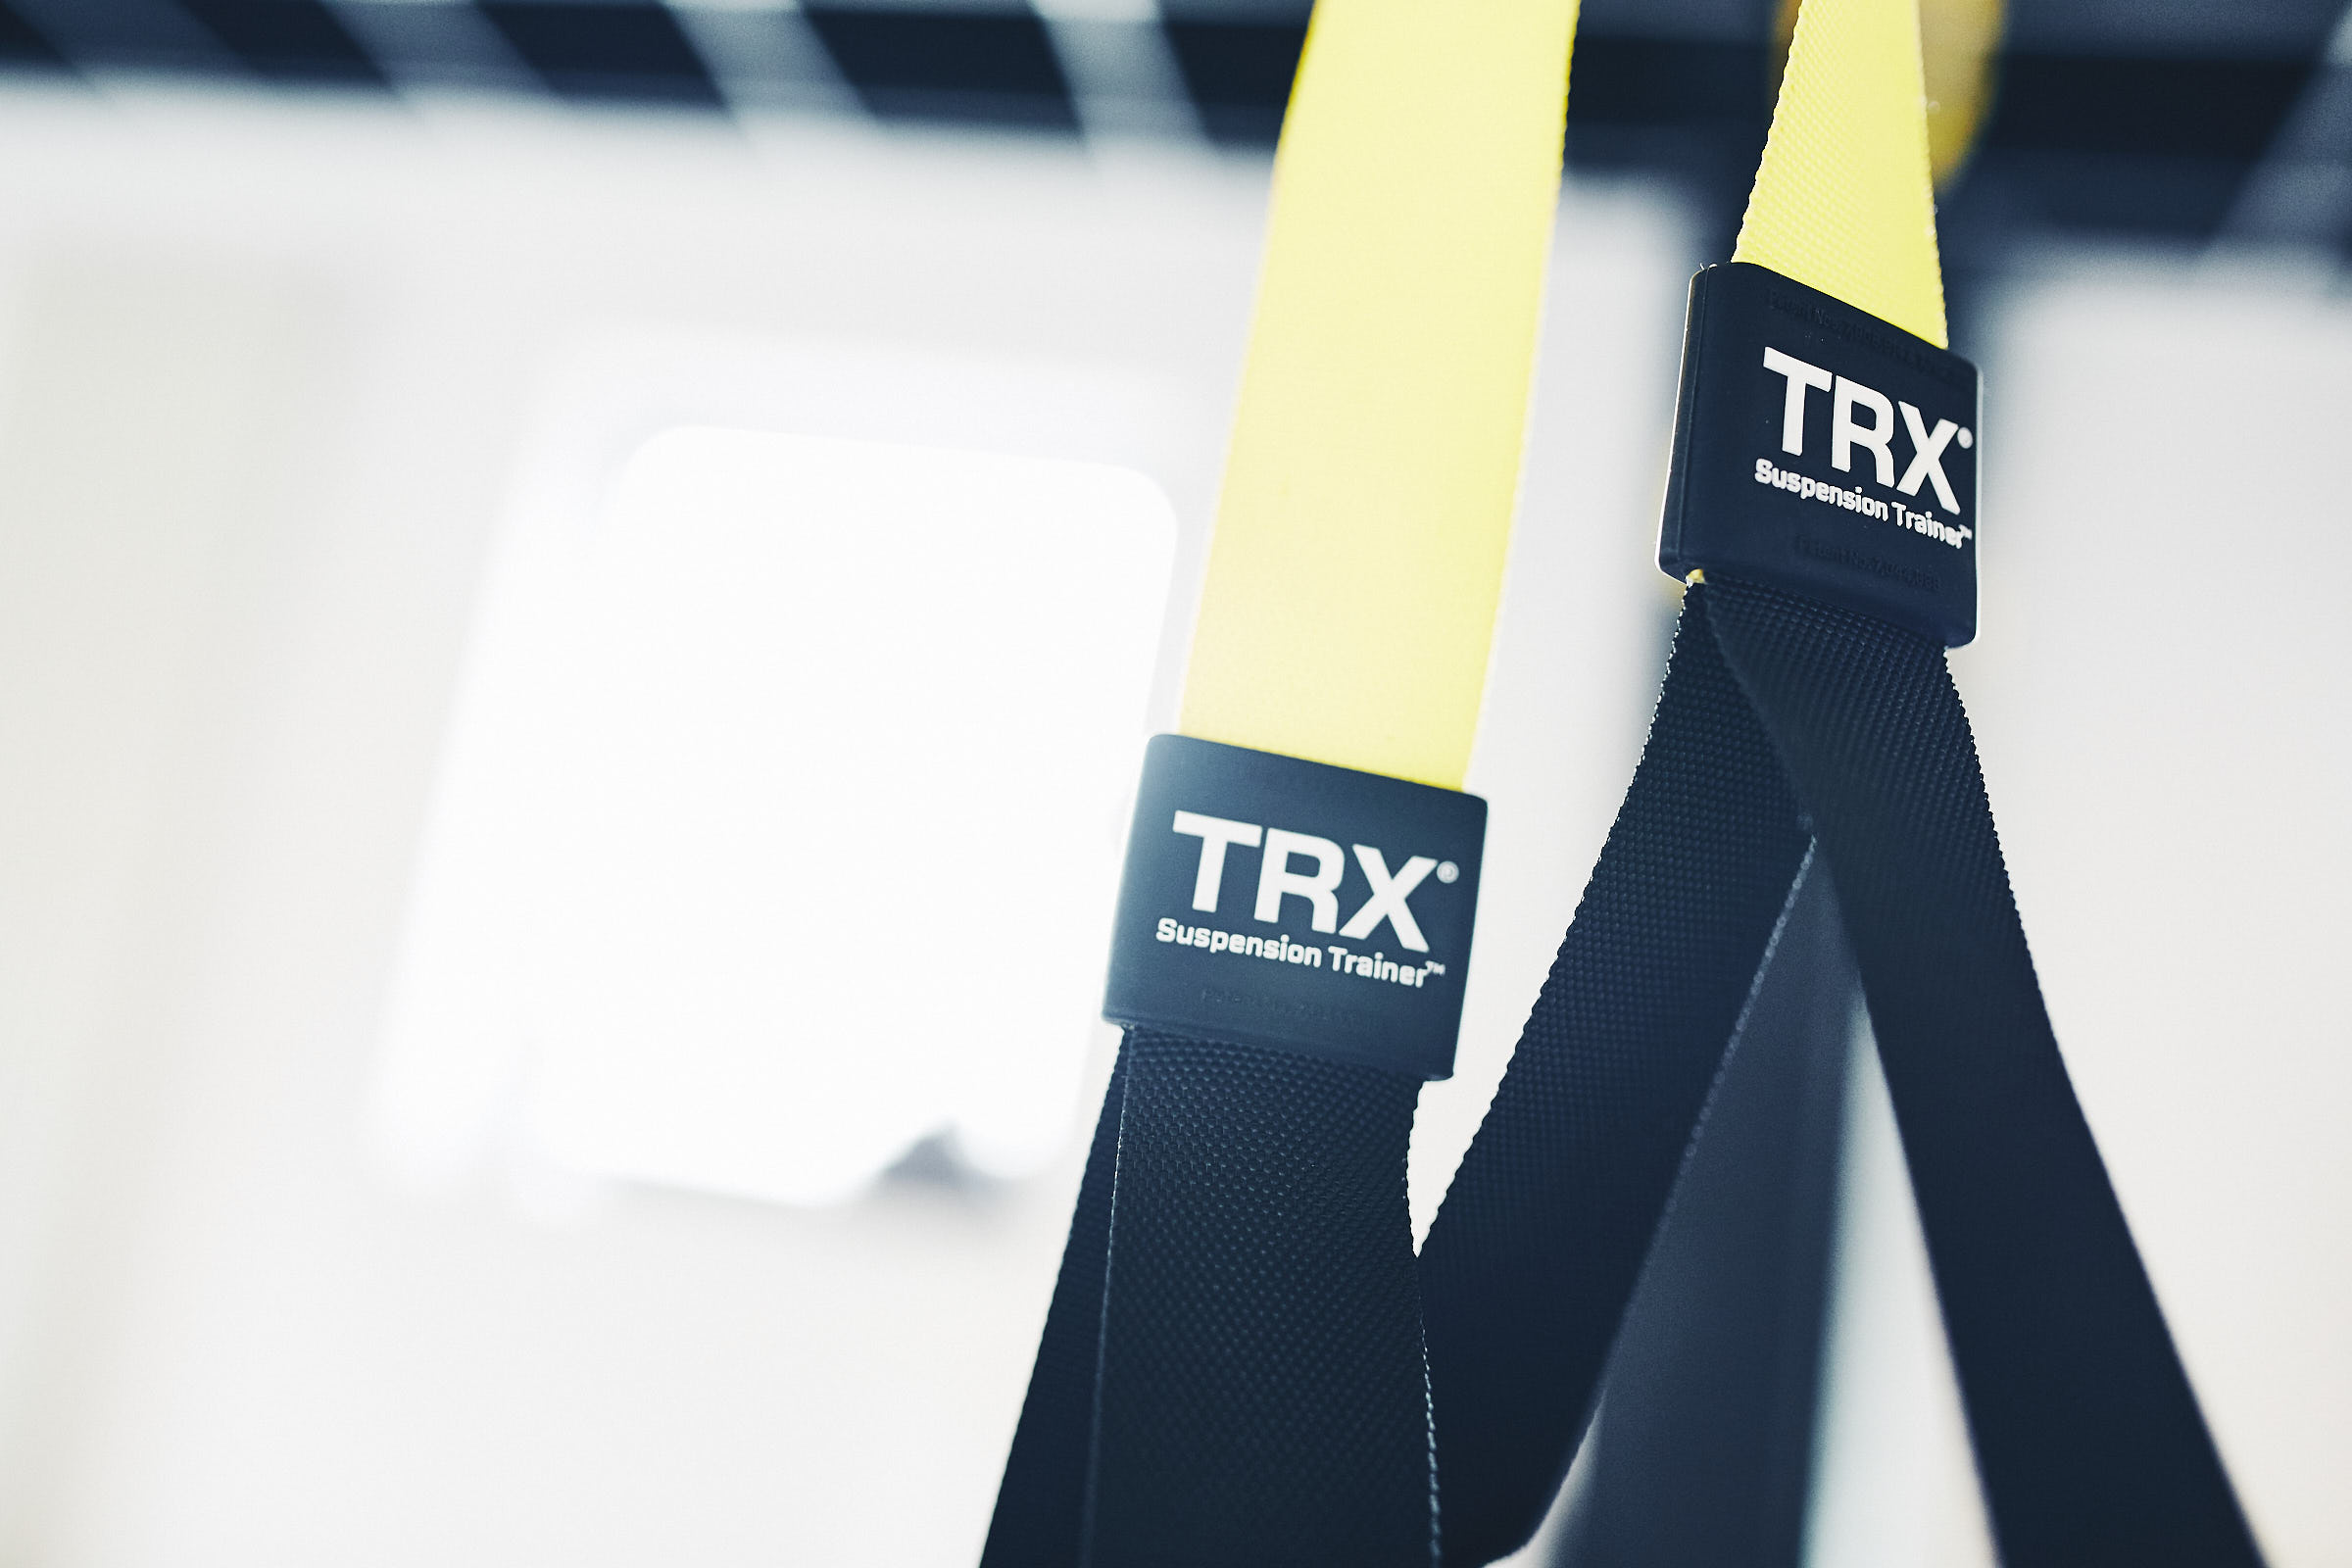 Fotografie eines TRX Suspension Trainer im Alineo Pilates Studio Trier